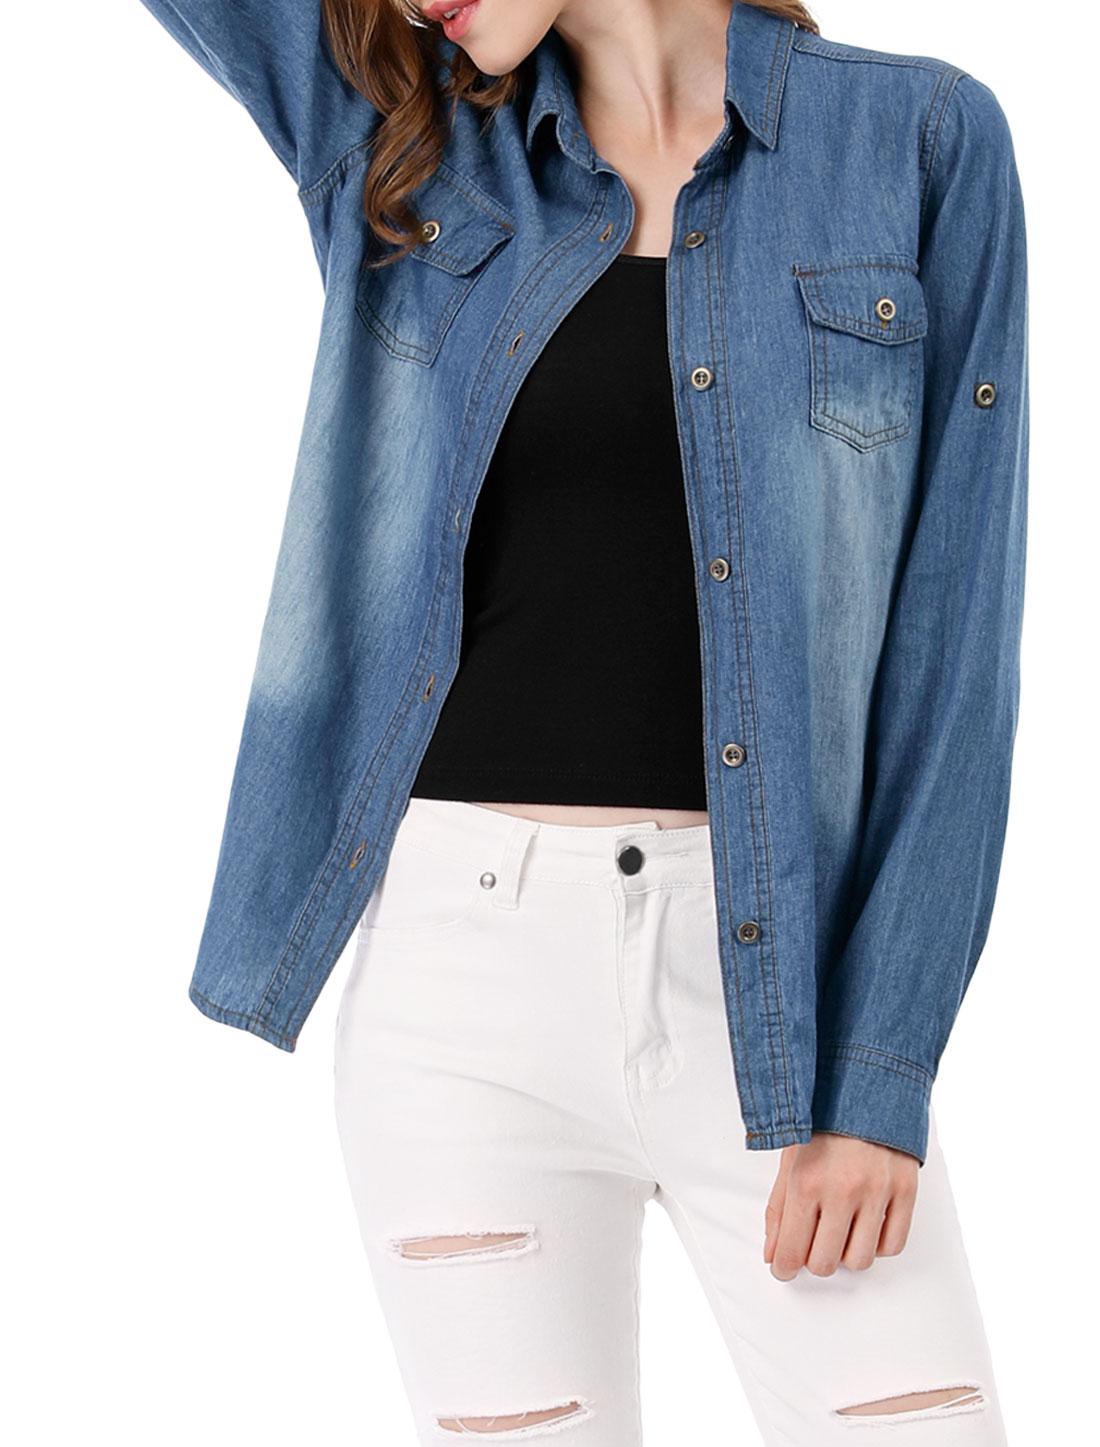 Women Long Sleeves Chest Pockets Western Denim Shirt Dark Blue M